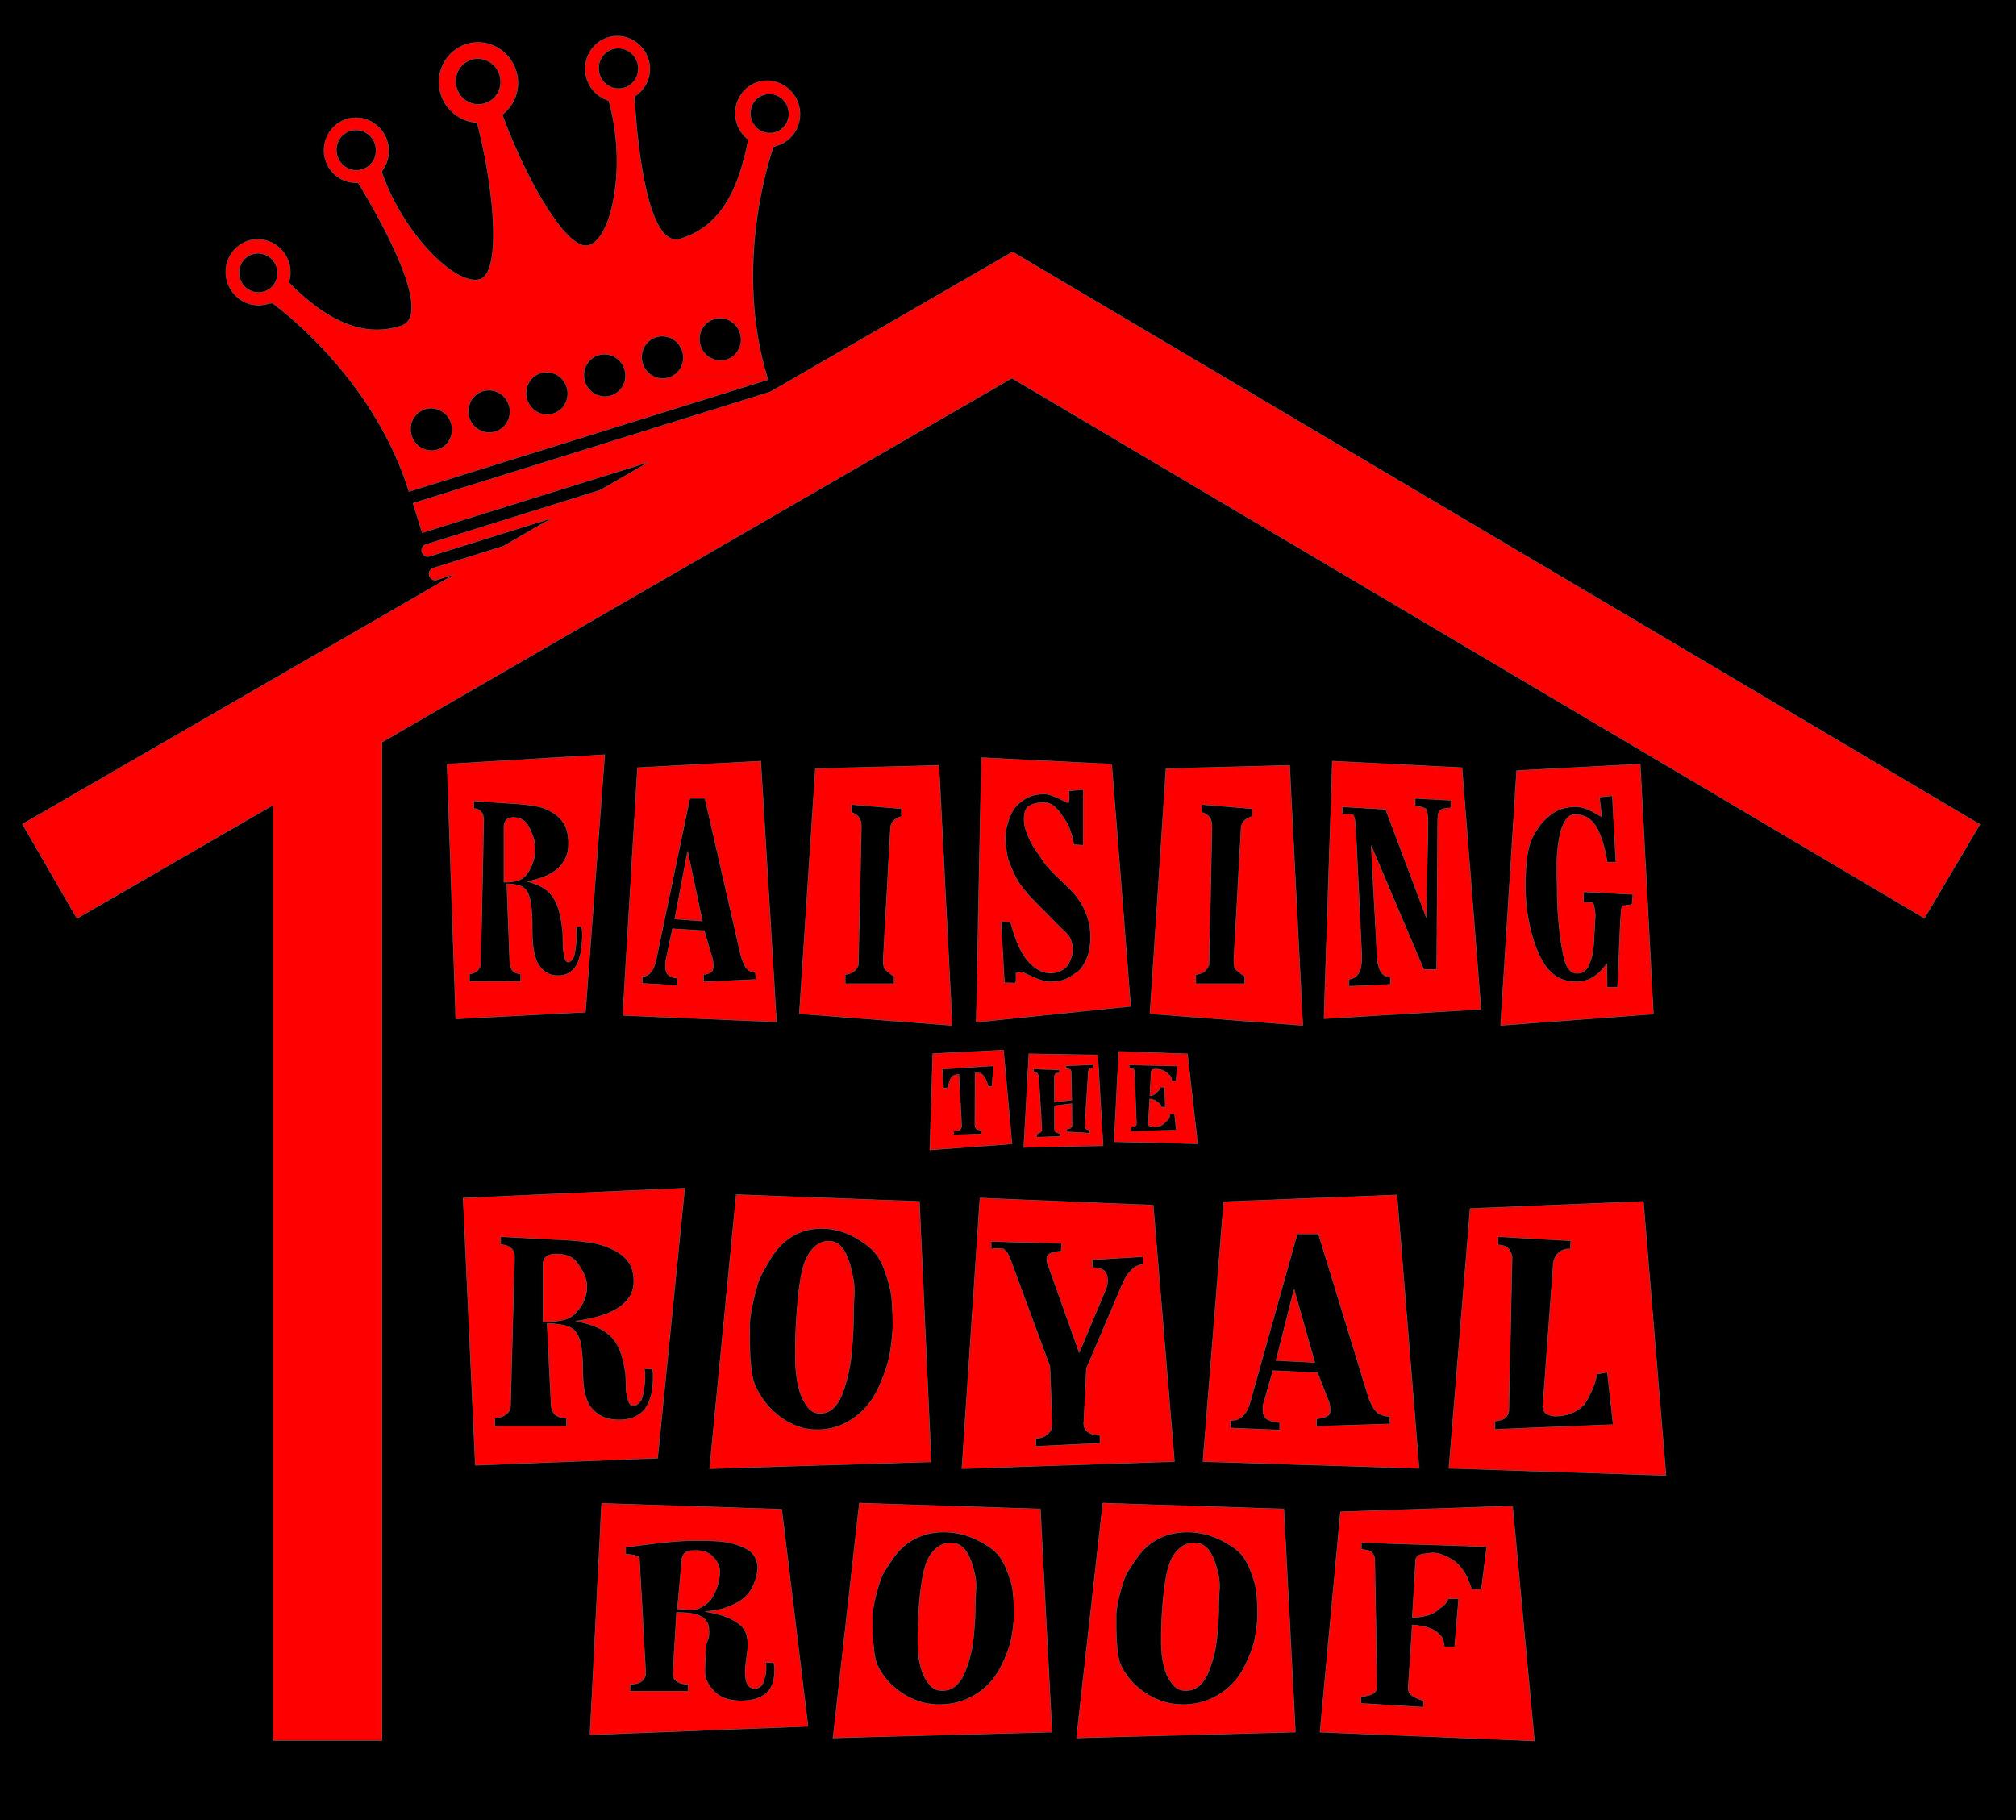 Raising the royal Roof colour.jpg